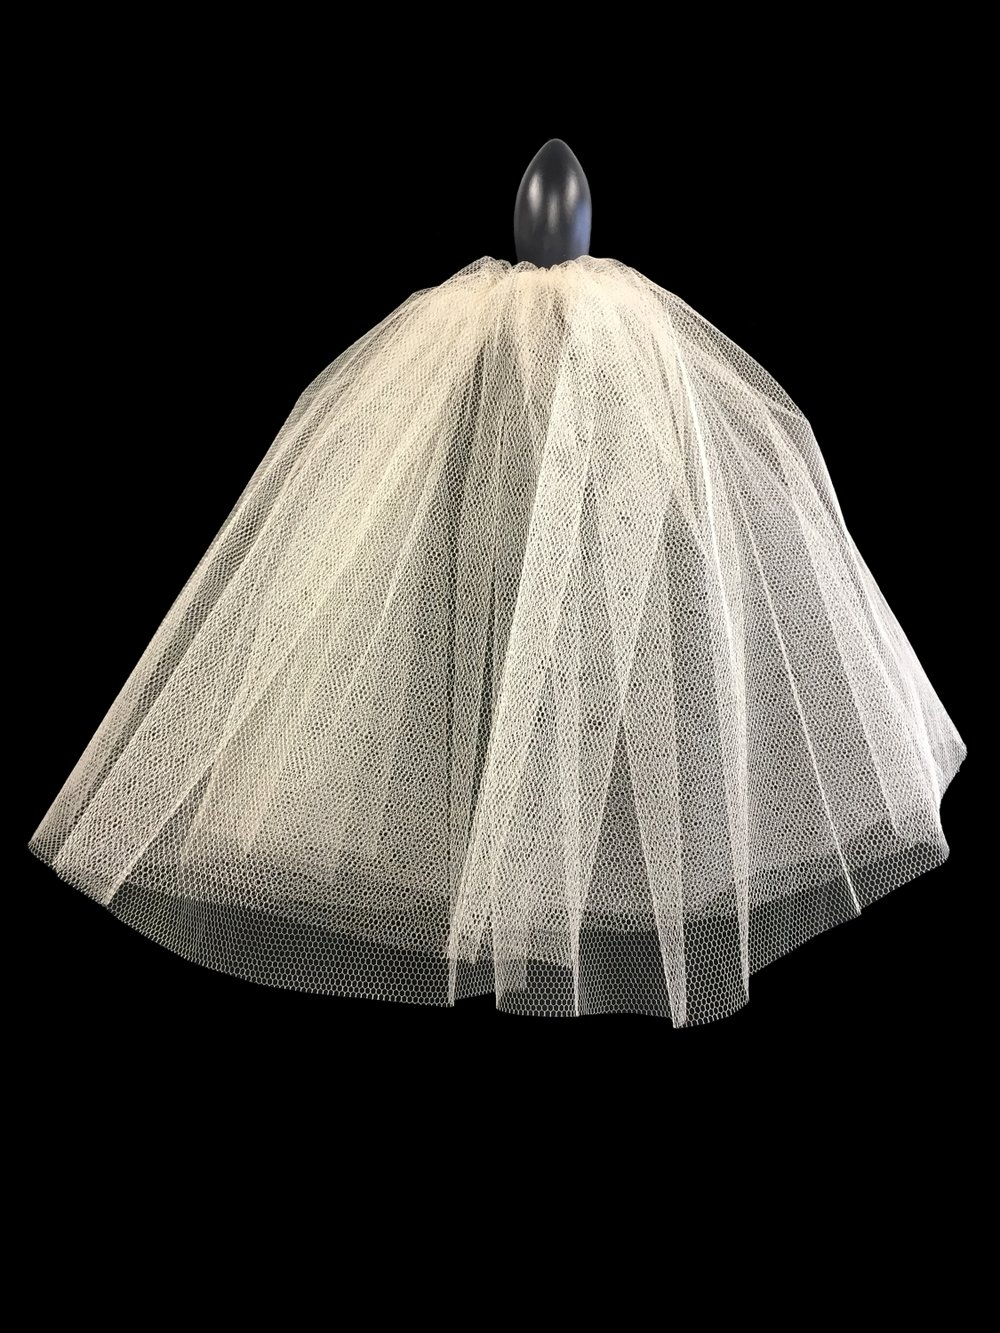 Style V5771-D __  18-18x72 - Bridesmaid Veil (Ivory)